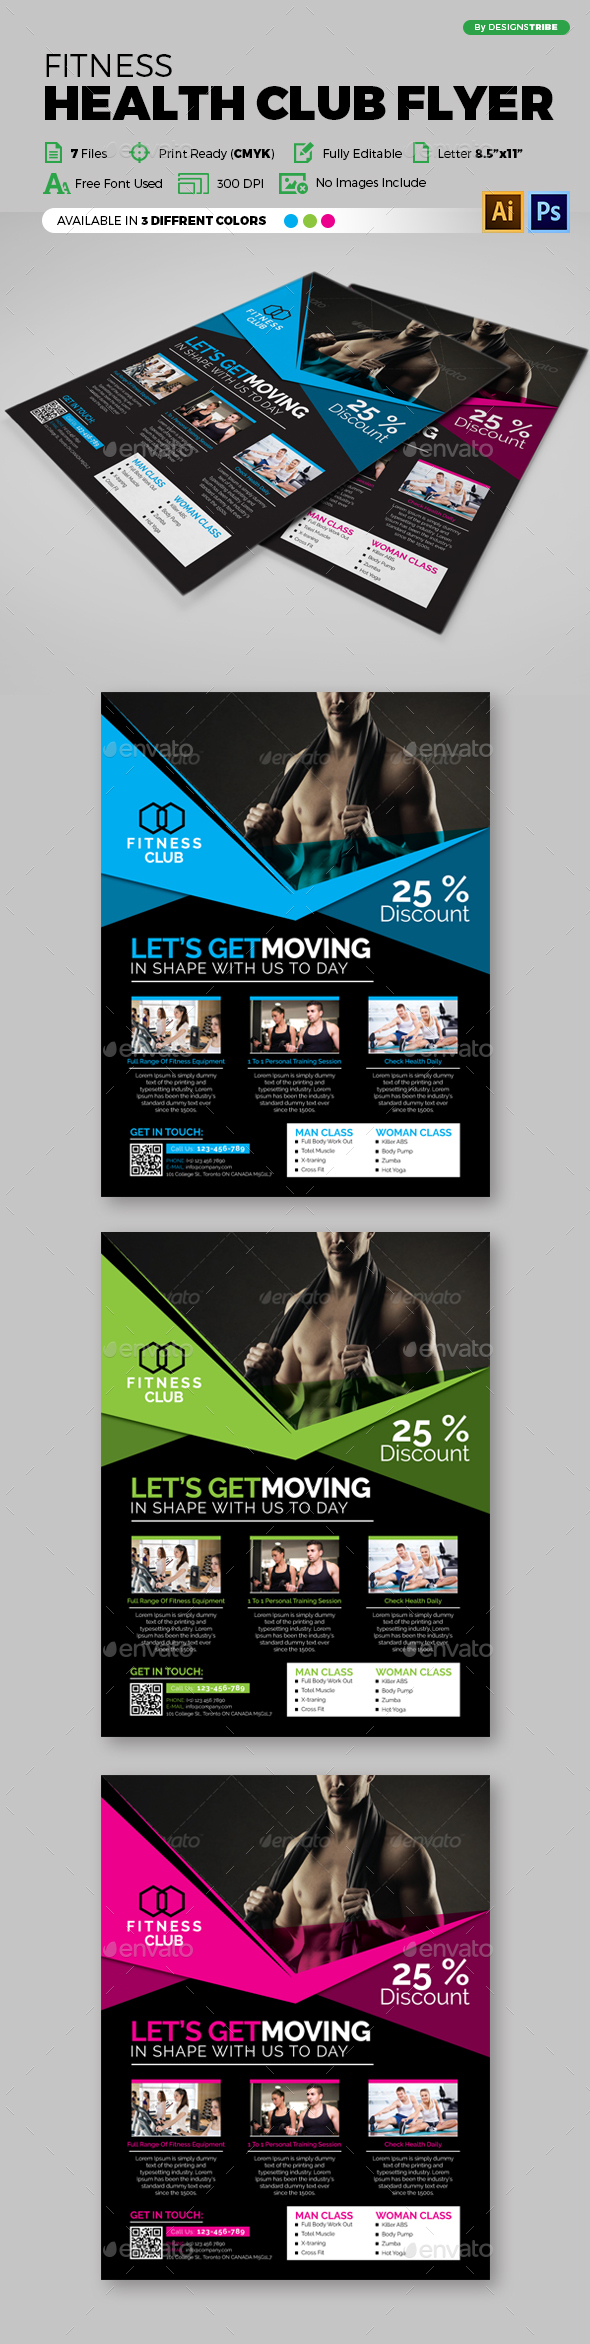 Fitness Health Club Flyer - Flyers Print Templates